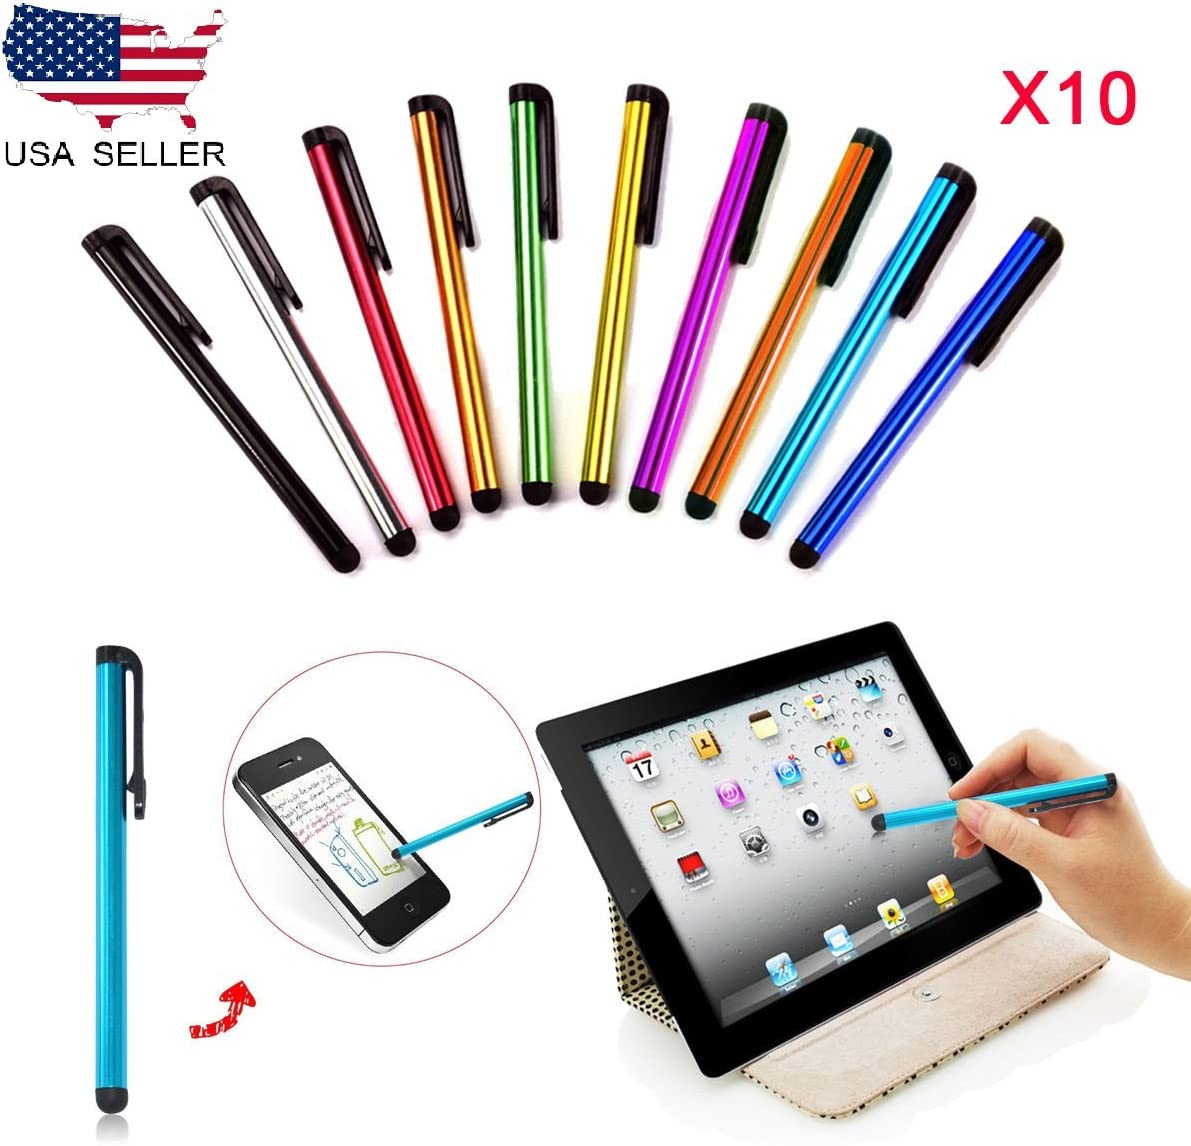 10x Sensitive Touch Screen Pen Stylus Universal Fr Tablet iPhone iPad Samsung PC